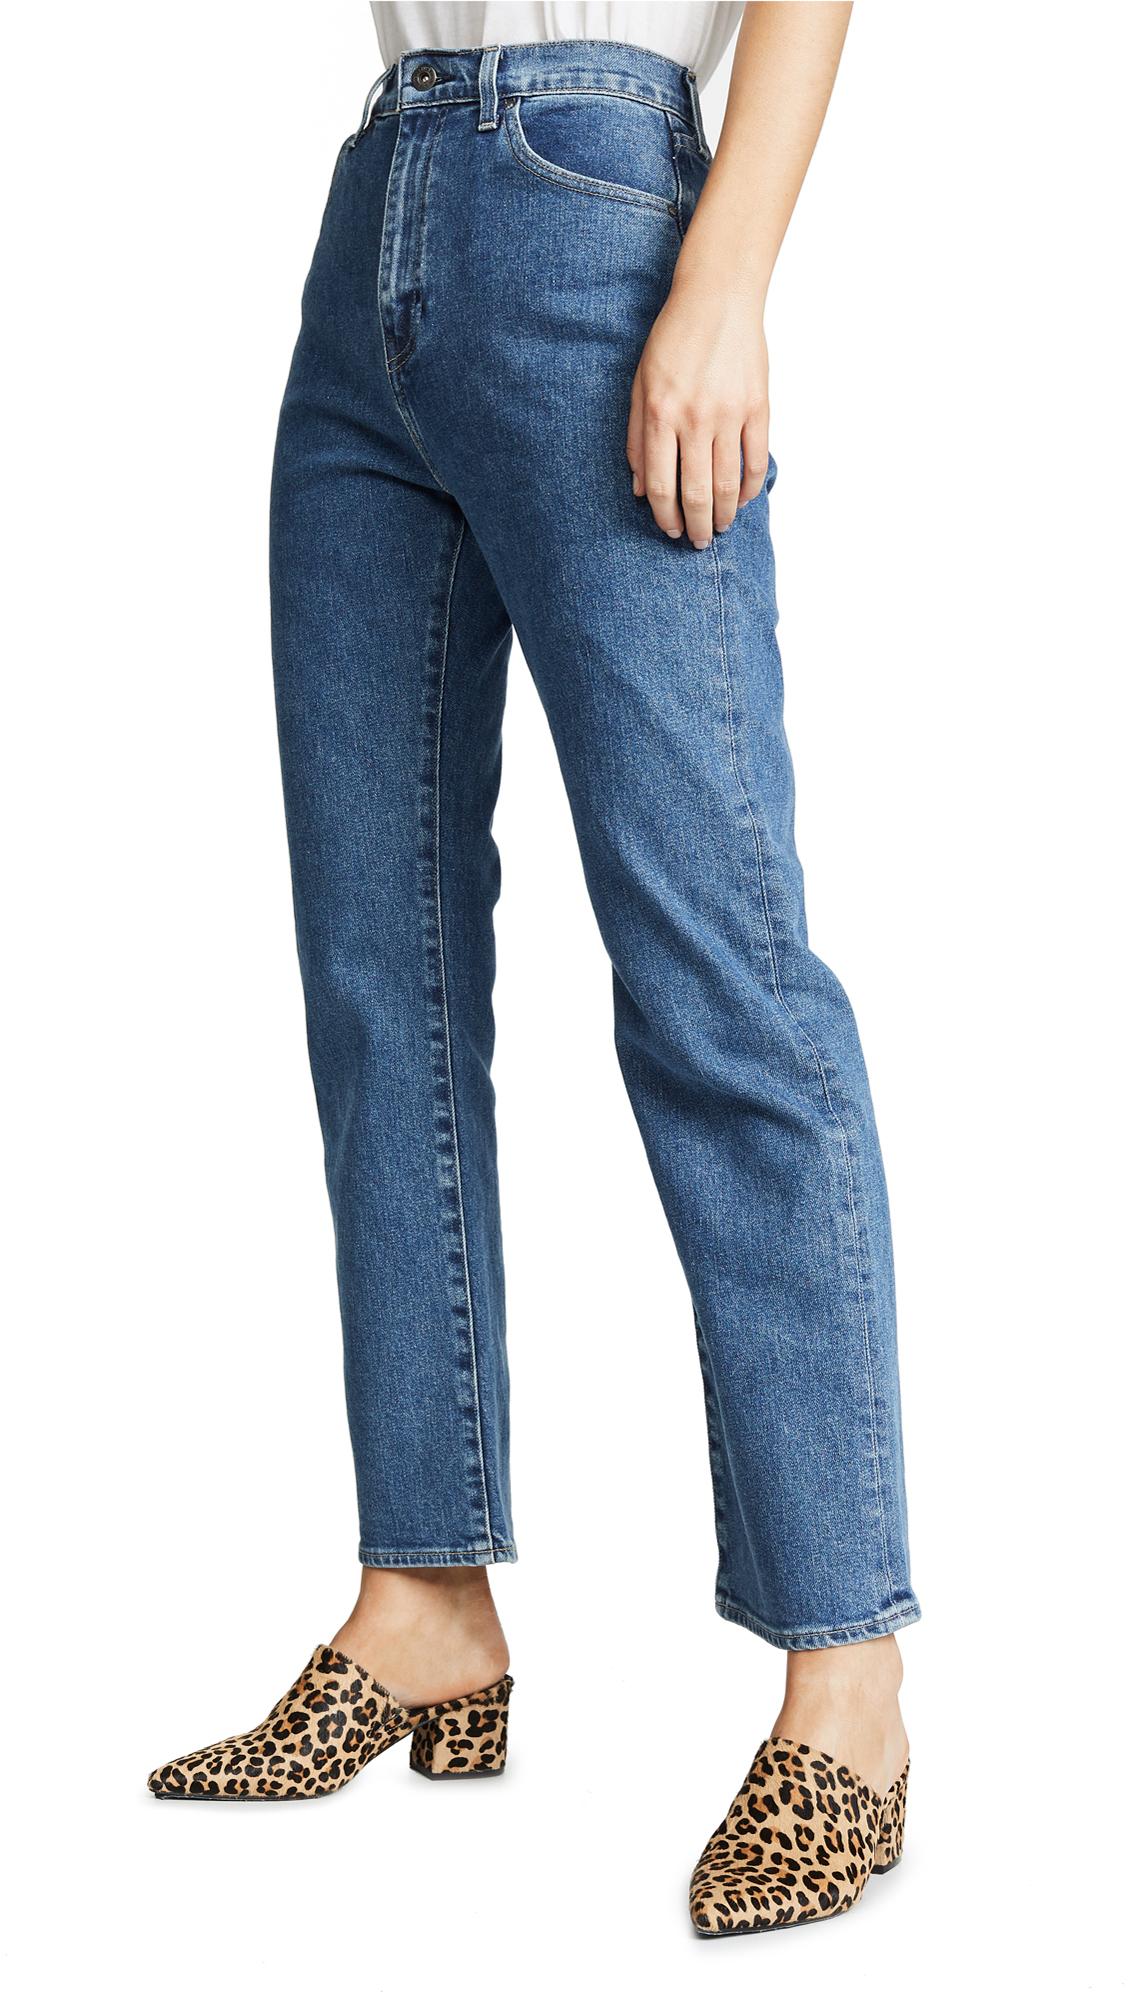 Levis 701 Highrise Straight Jeans - Selvedge Medium Stonewash